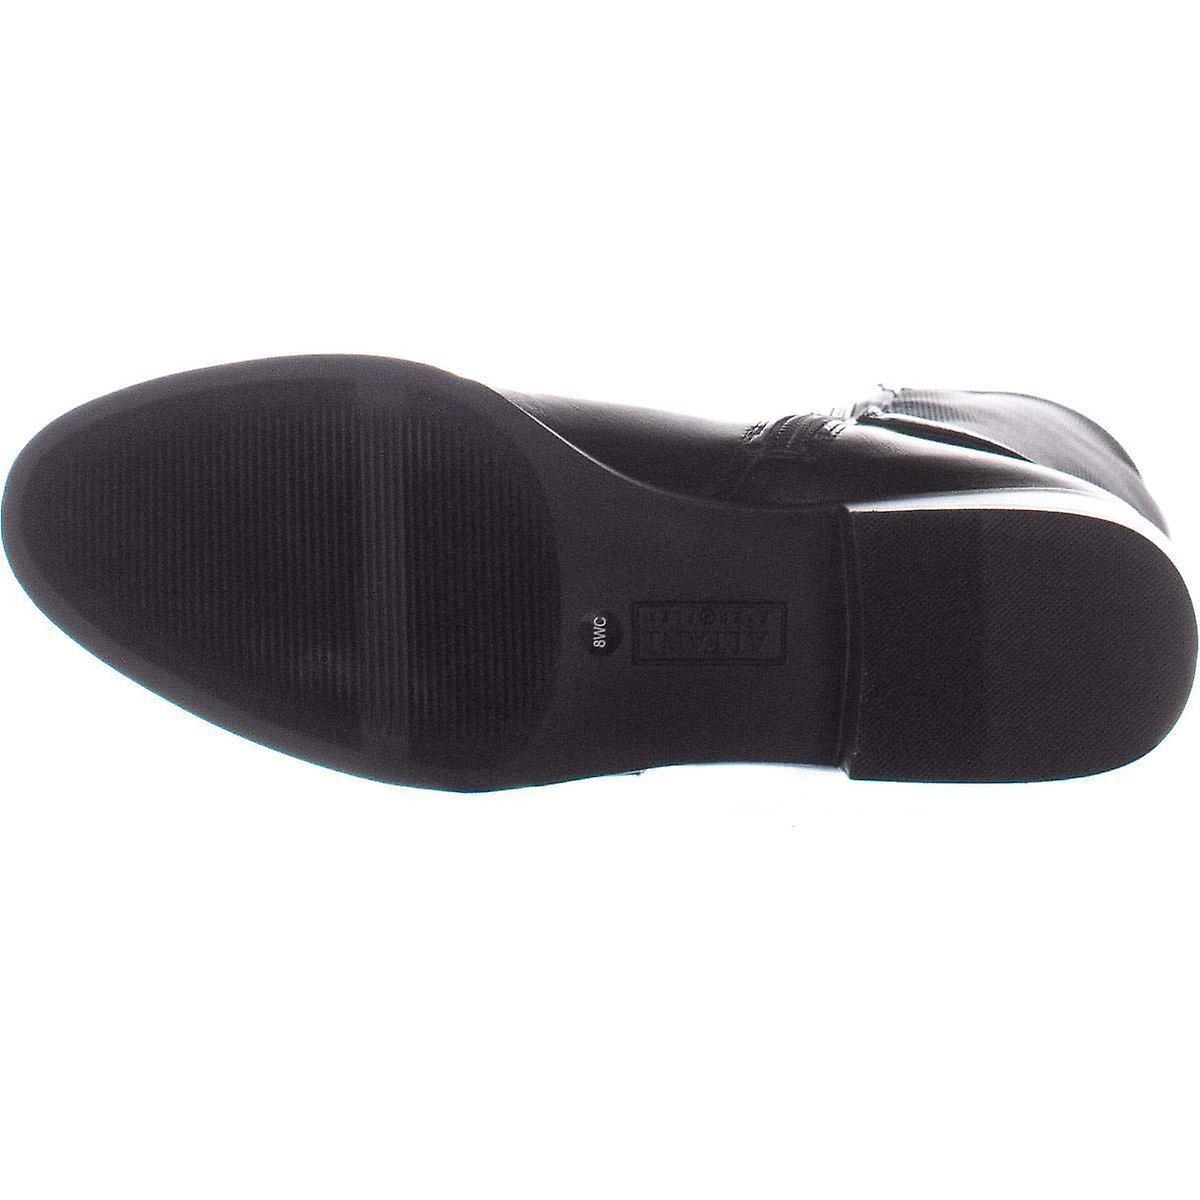 A35 Kallumm Wide Calf Knee High Boots, Czarny/Neo, 5 Stany Zjednoczone zmiNS